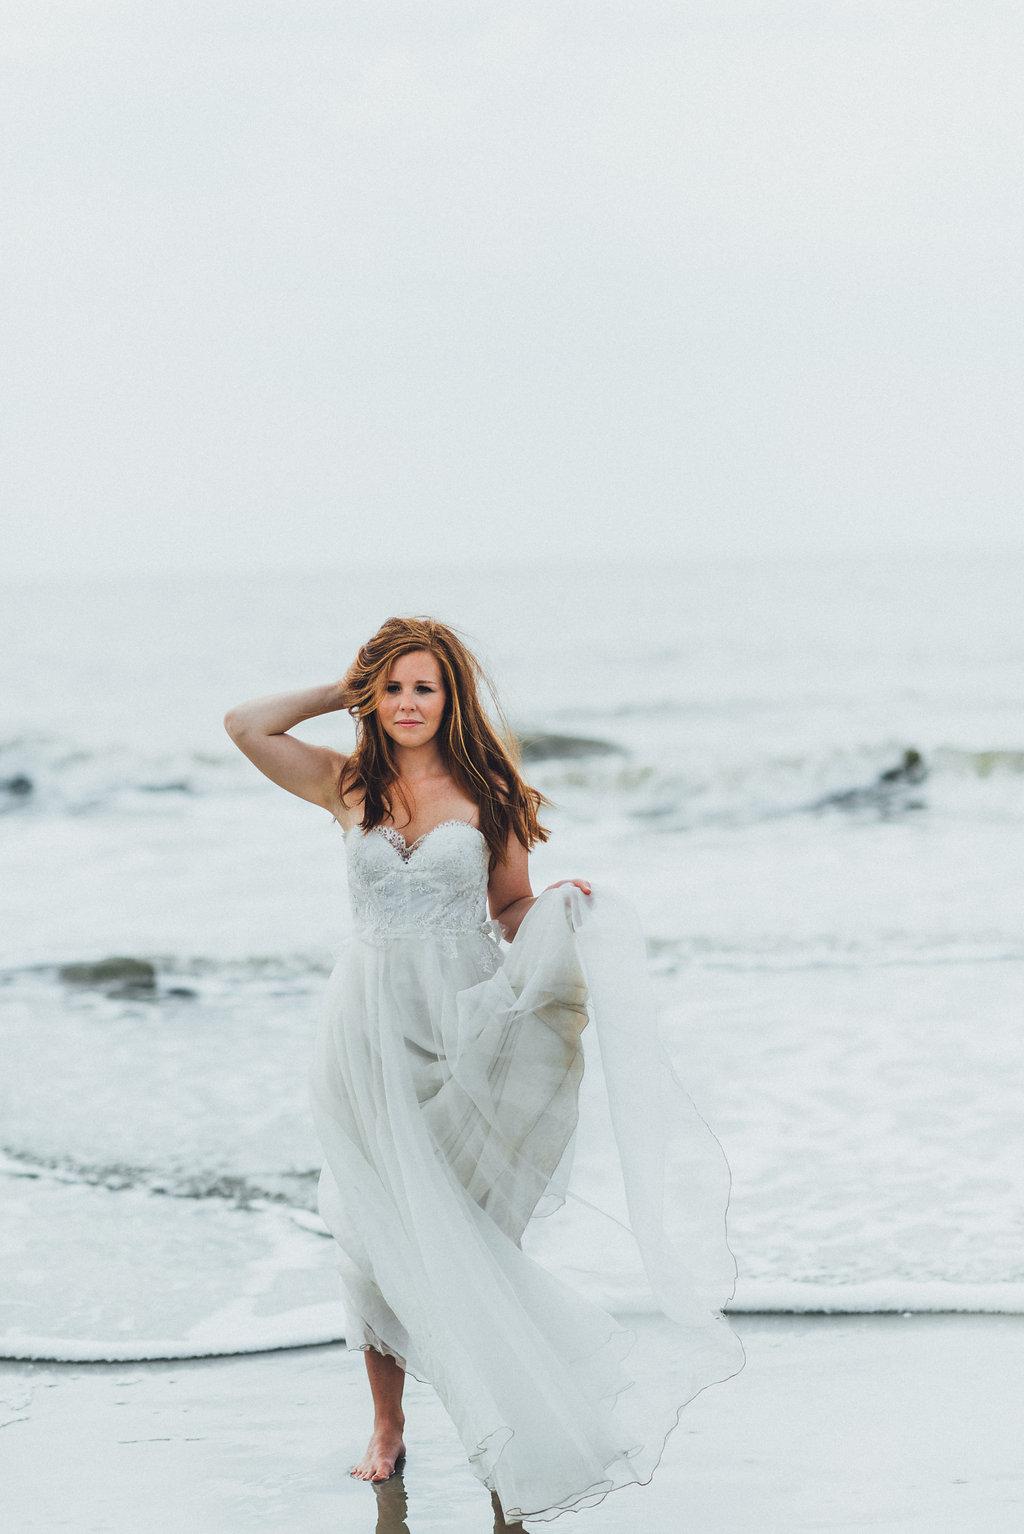 Urban-Poppy-Southern-Wedding-Mallory-and-Justin-photography-ivory-and-beau-bridal-boutique-sarah-seven-marion-boho-bride-indie-bride-indie-wedding-dress-savannah-weddings-hilton-head-weddings-beach-wedding-18.jpg